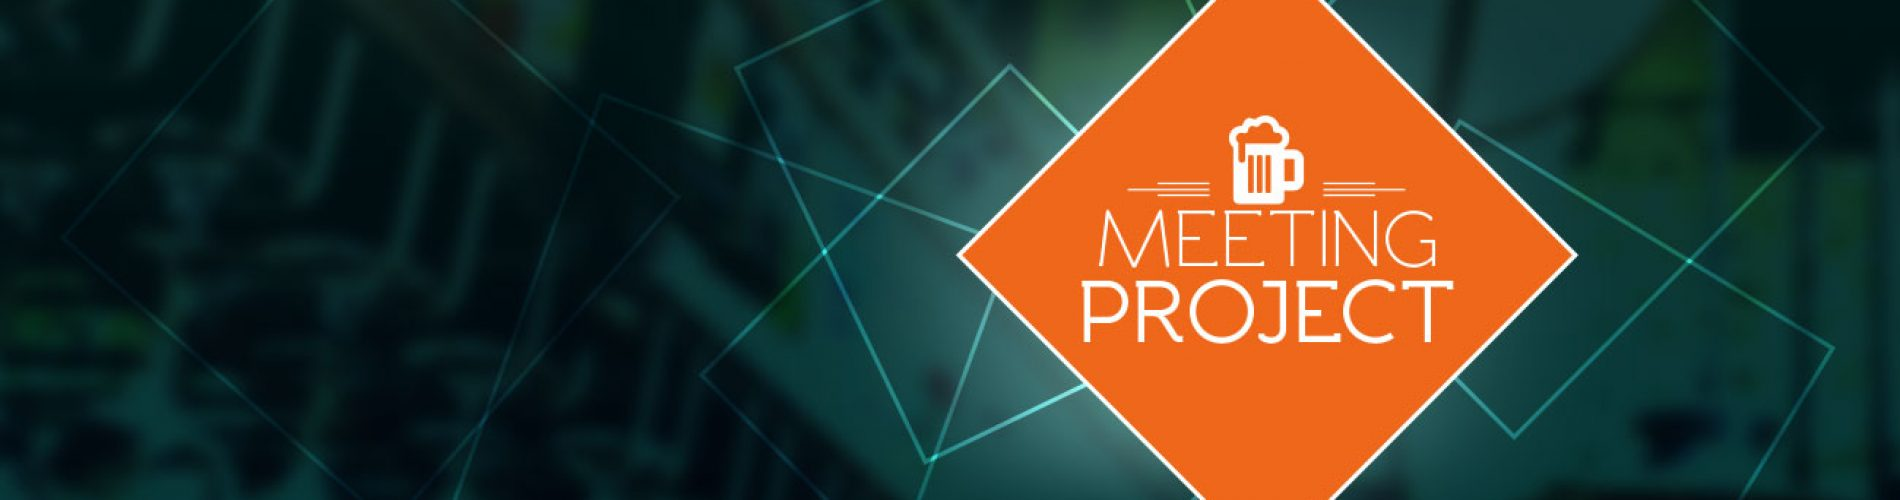 inscricoes-abertas-para-o-1o-meeting-project